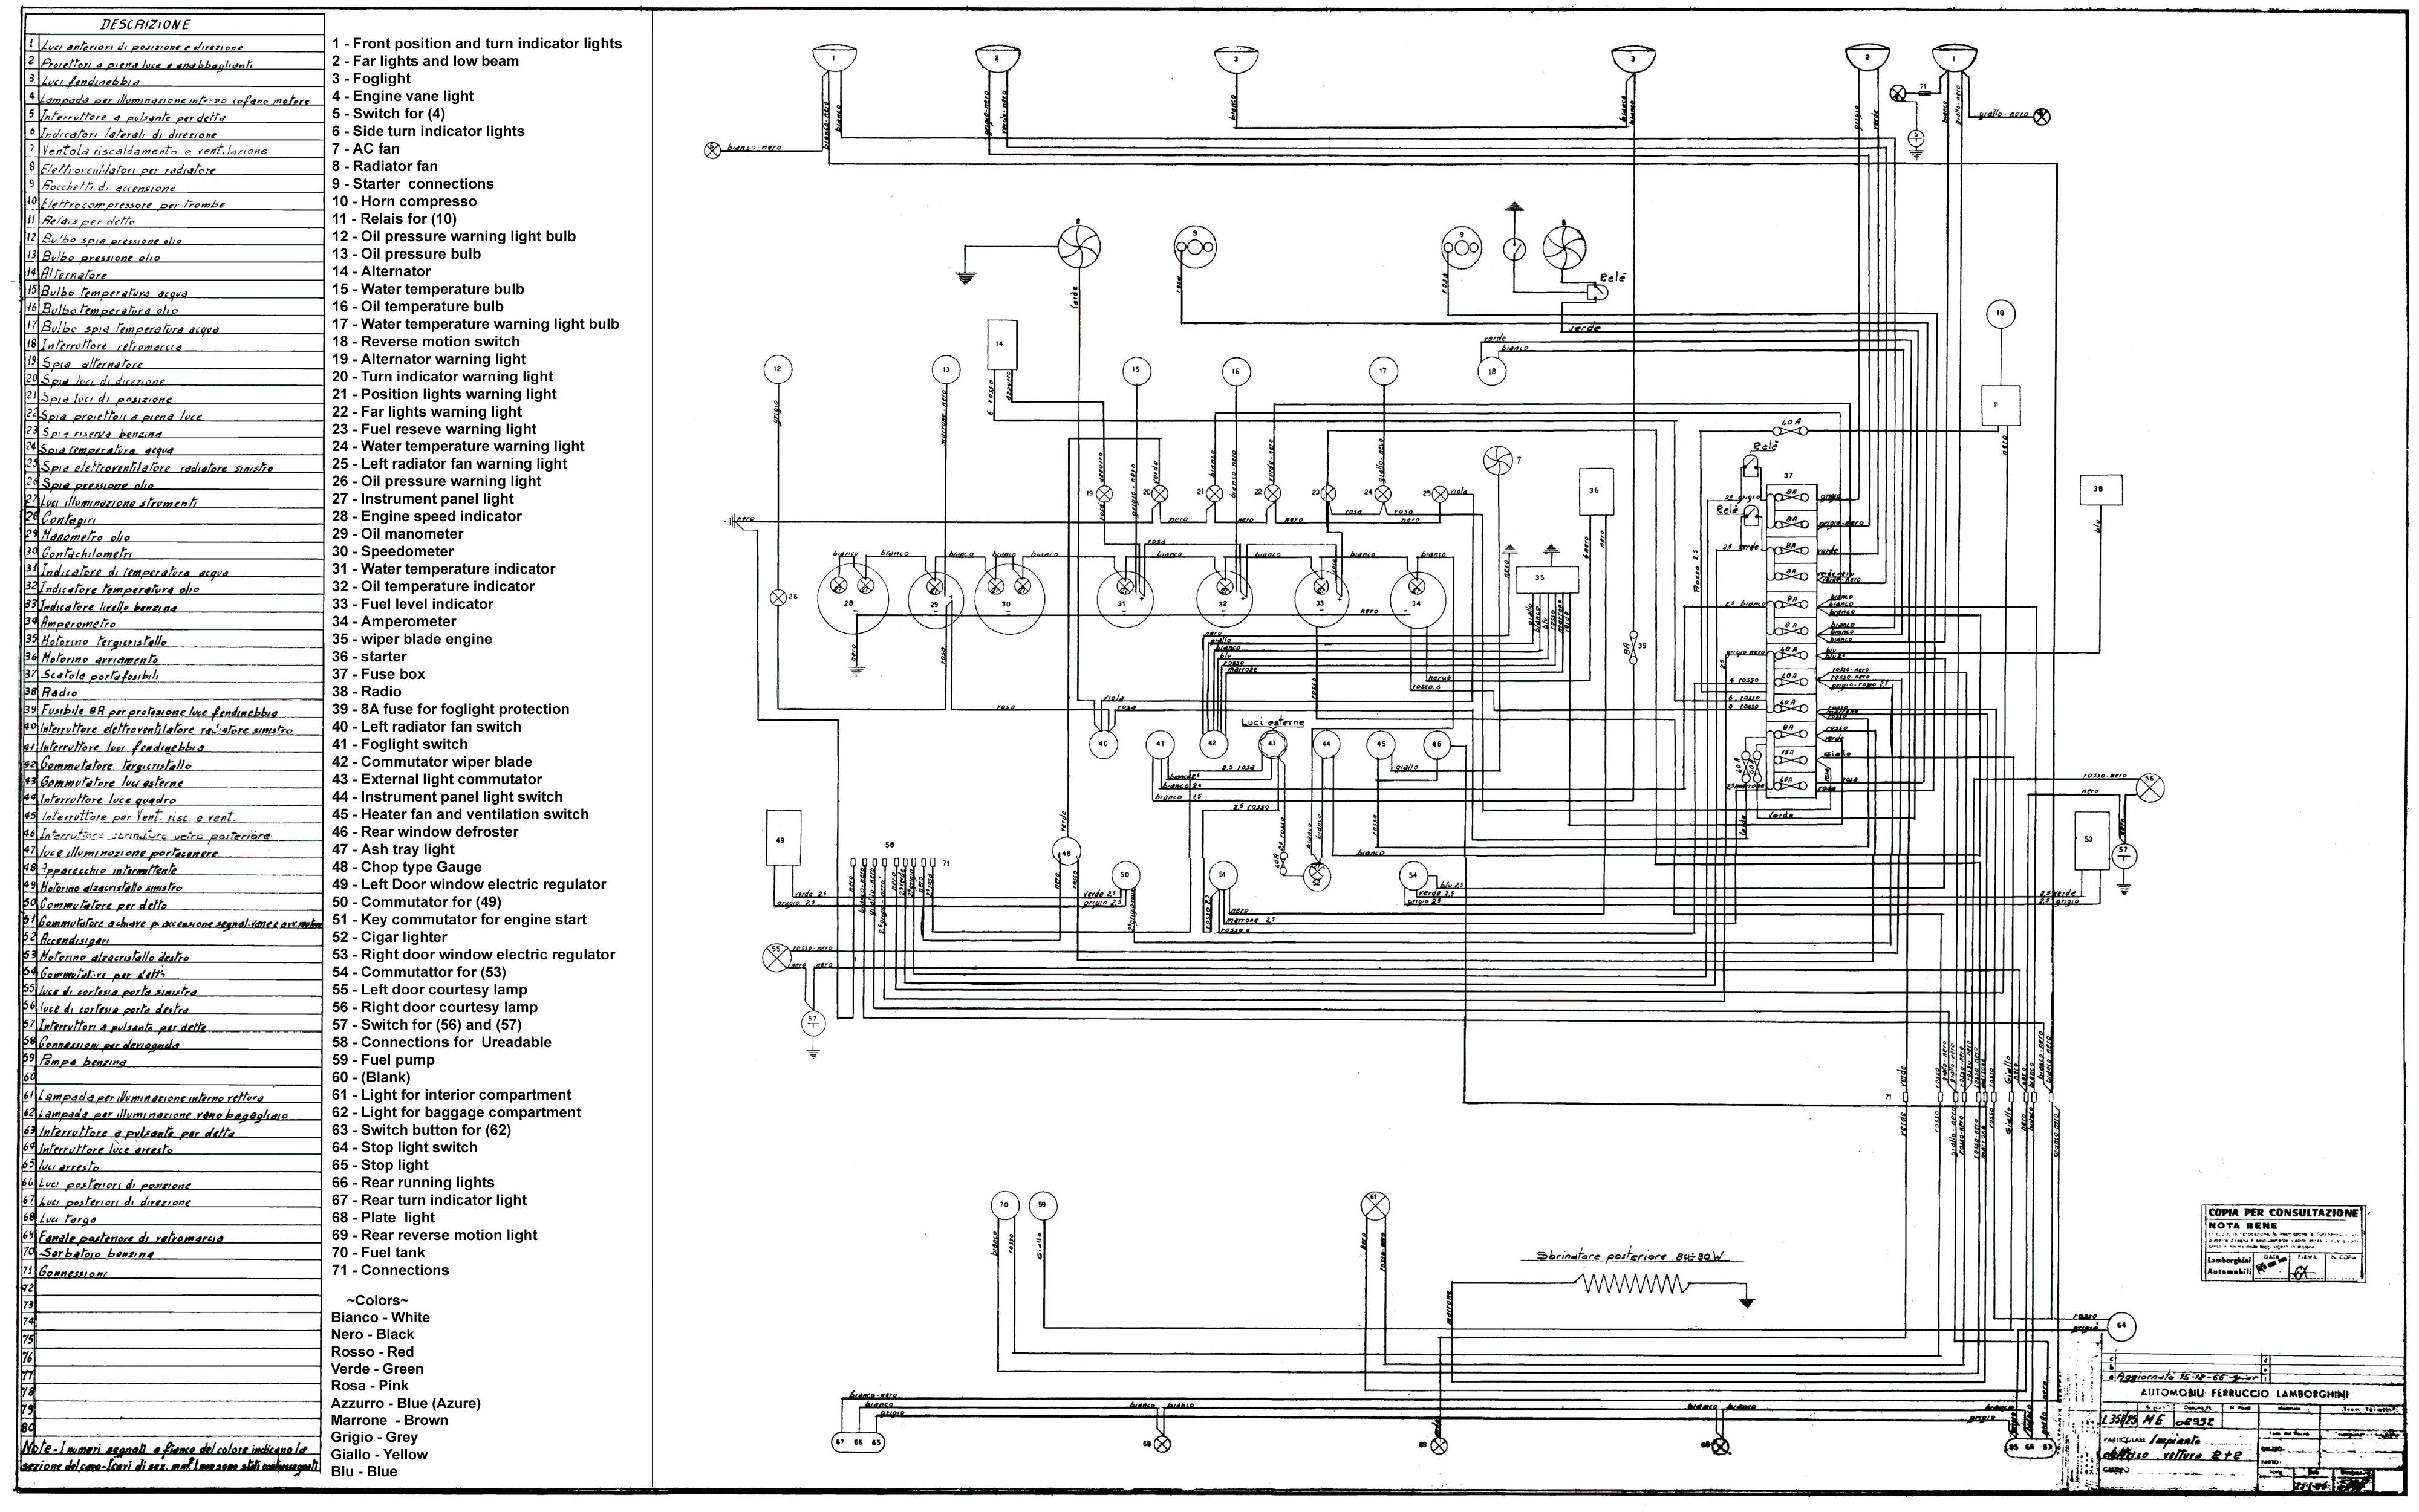 1998 isuzu rodeo stereo wiring diagram utility trailer brake volvo 960 transmission imageresizertool com